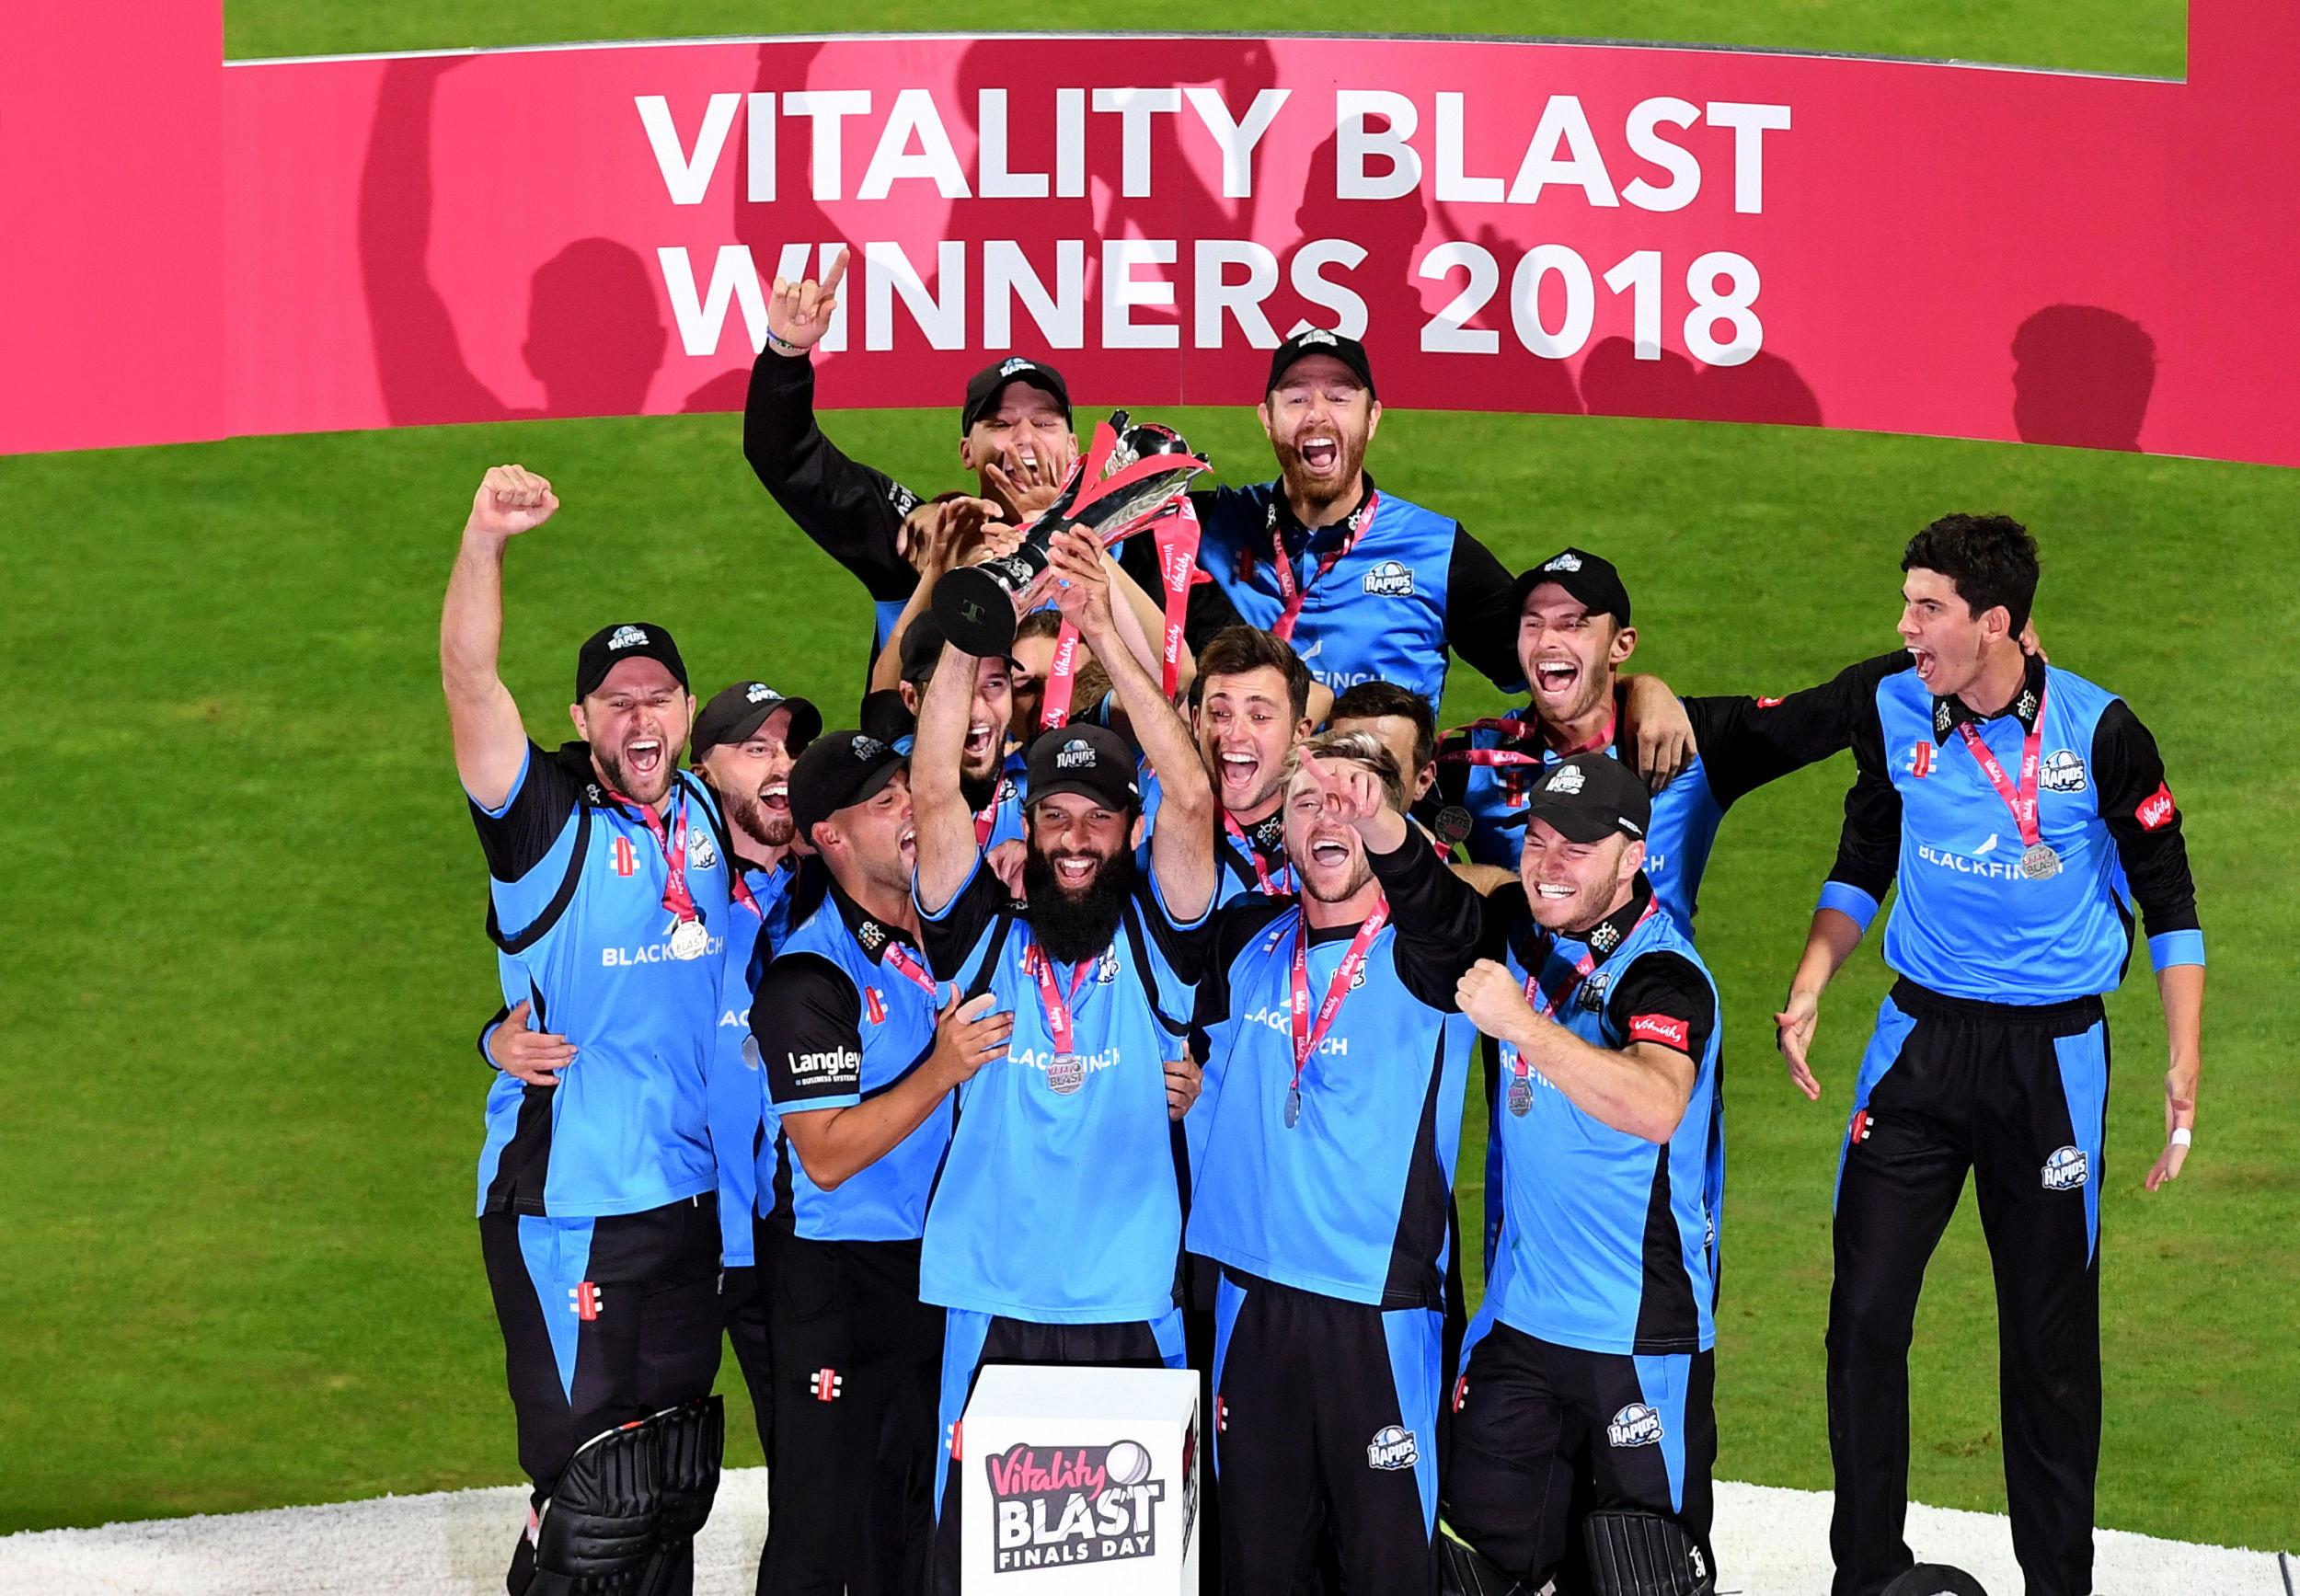 Vitality T20 Blast Finals Day at Edgbaston 2019 | Gala Hospitality